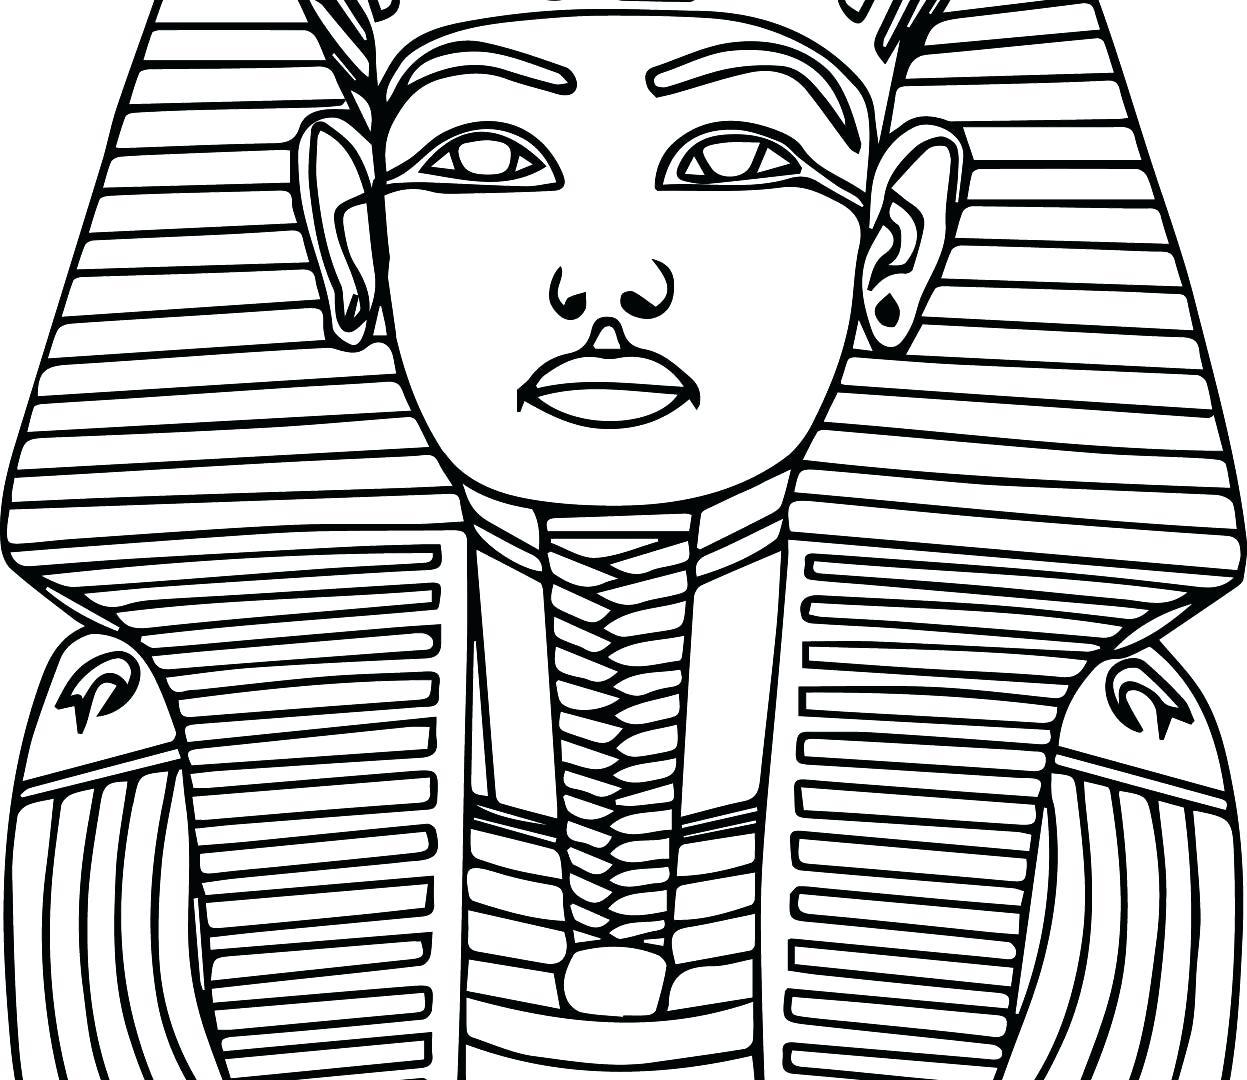 Sarcophagus Drawing at GetDrawings | Free download